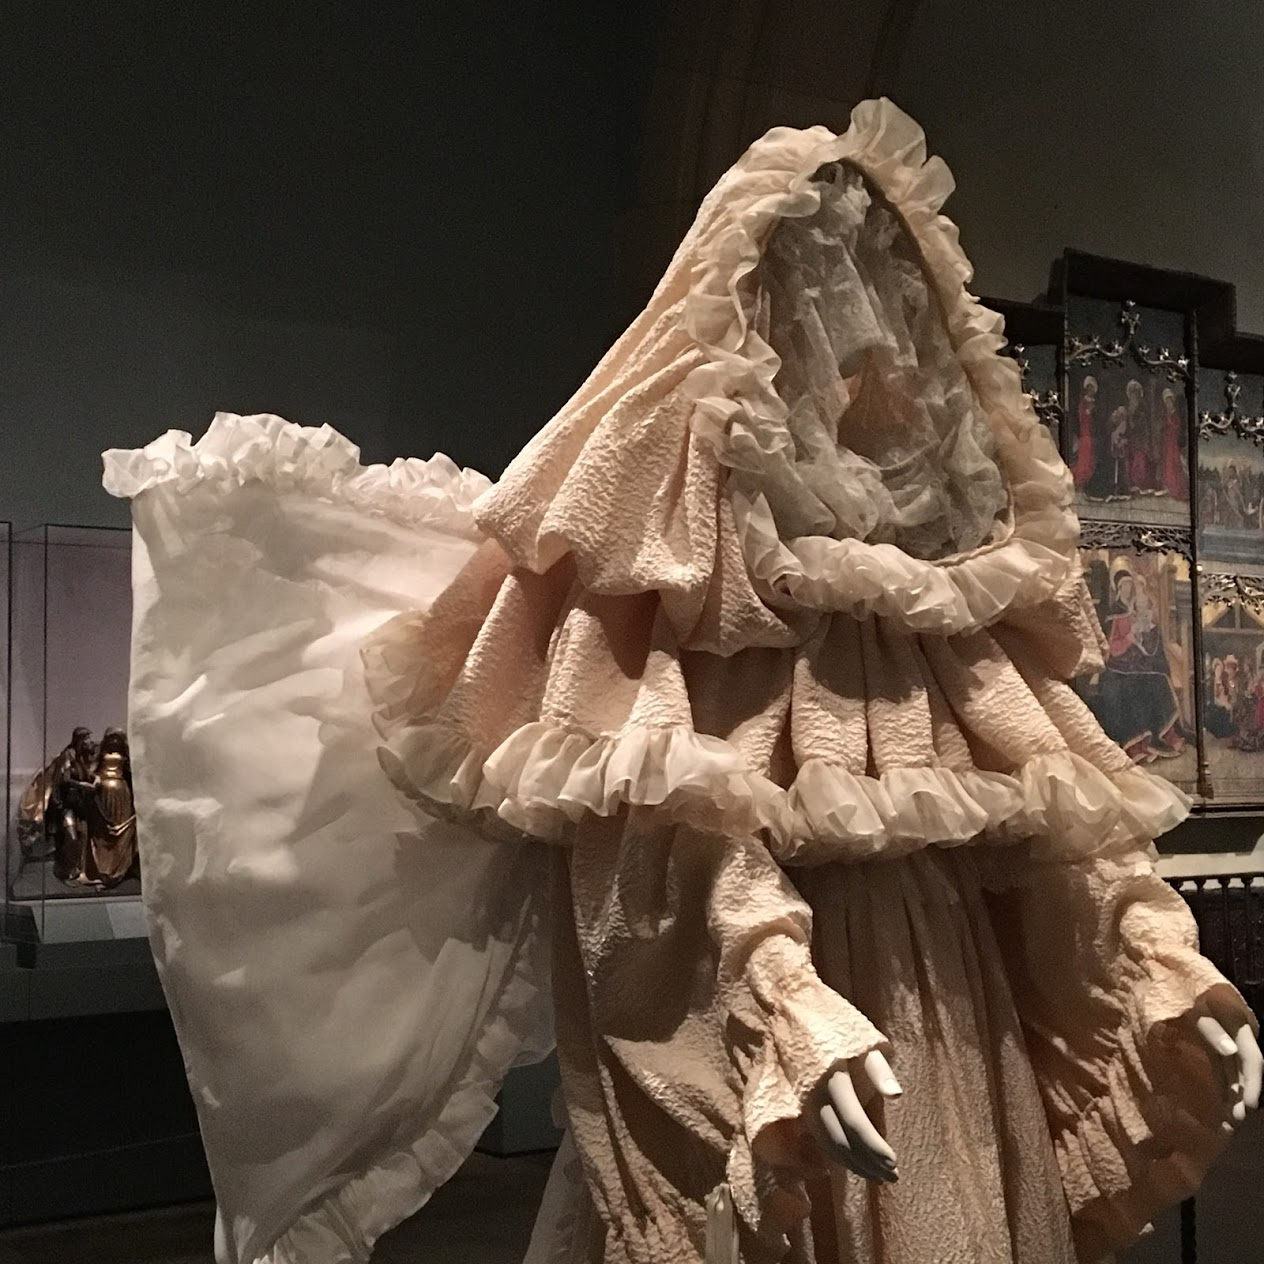 met-wedding-gown.JPG